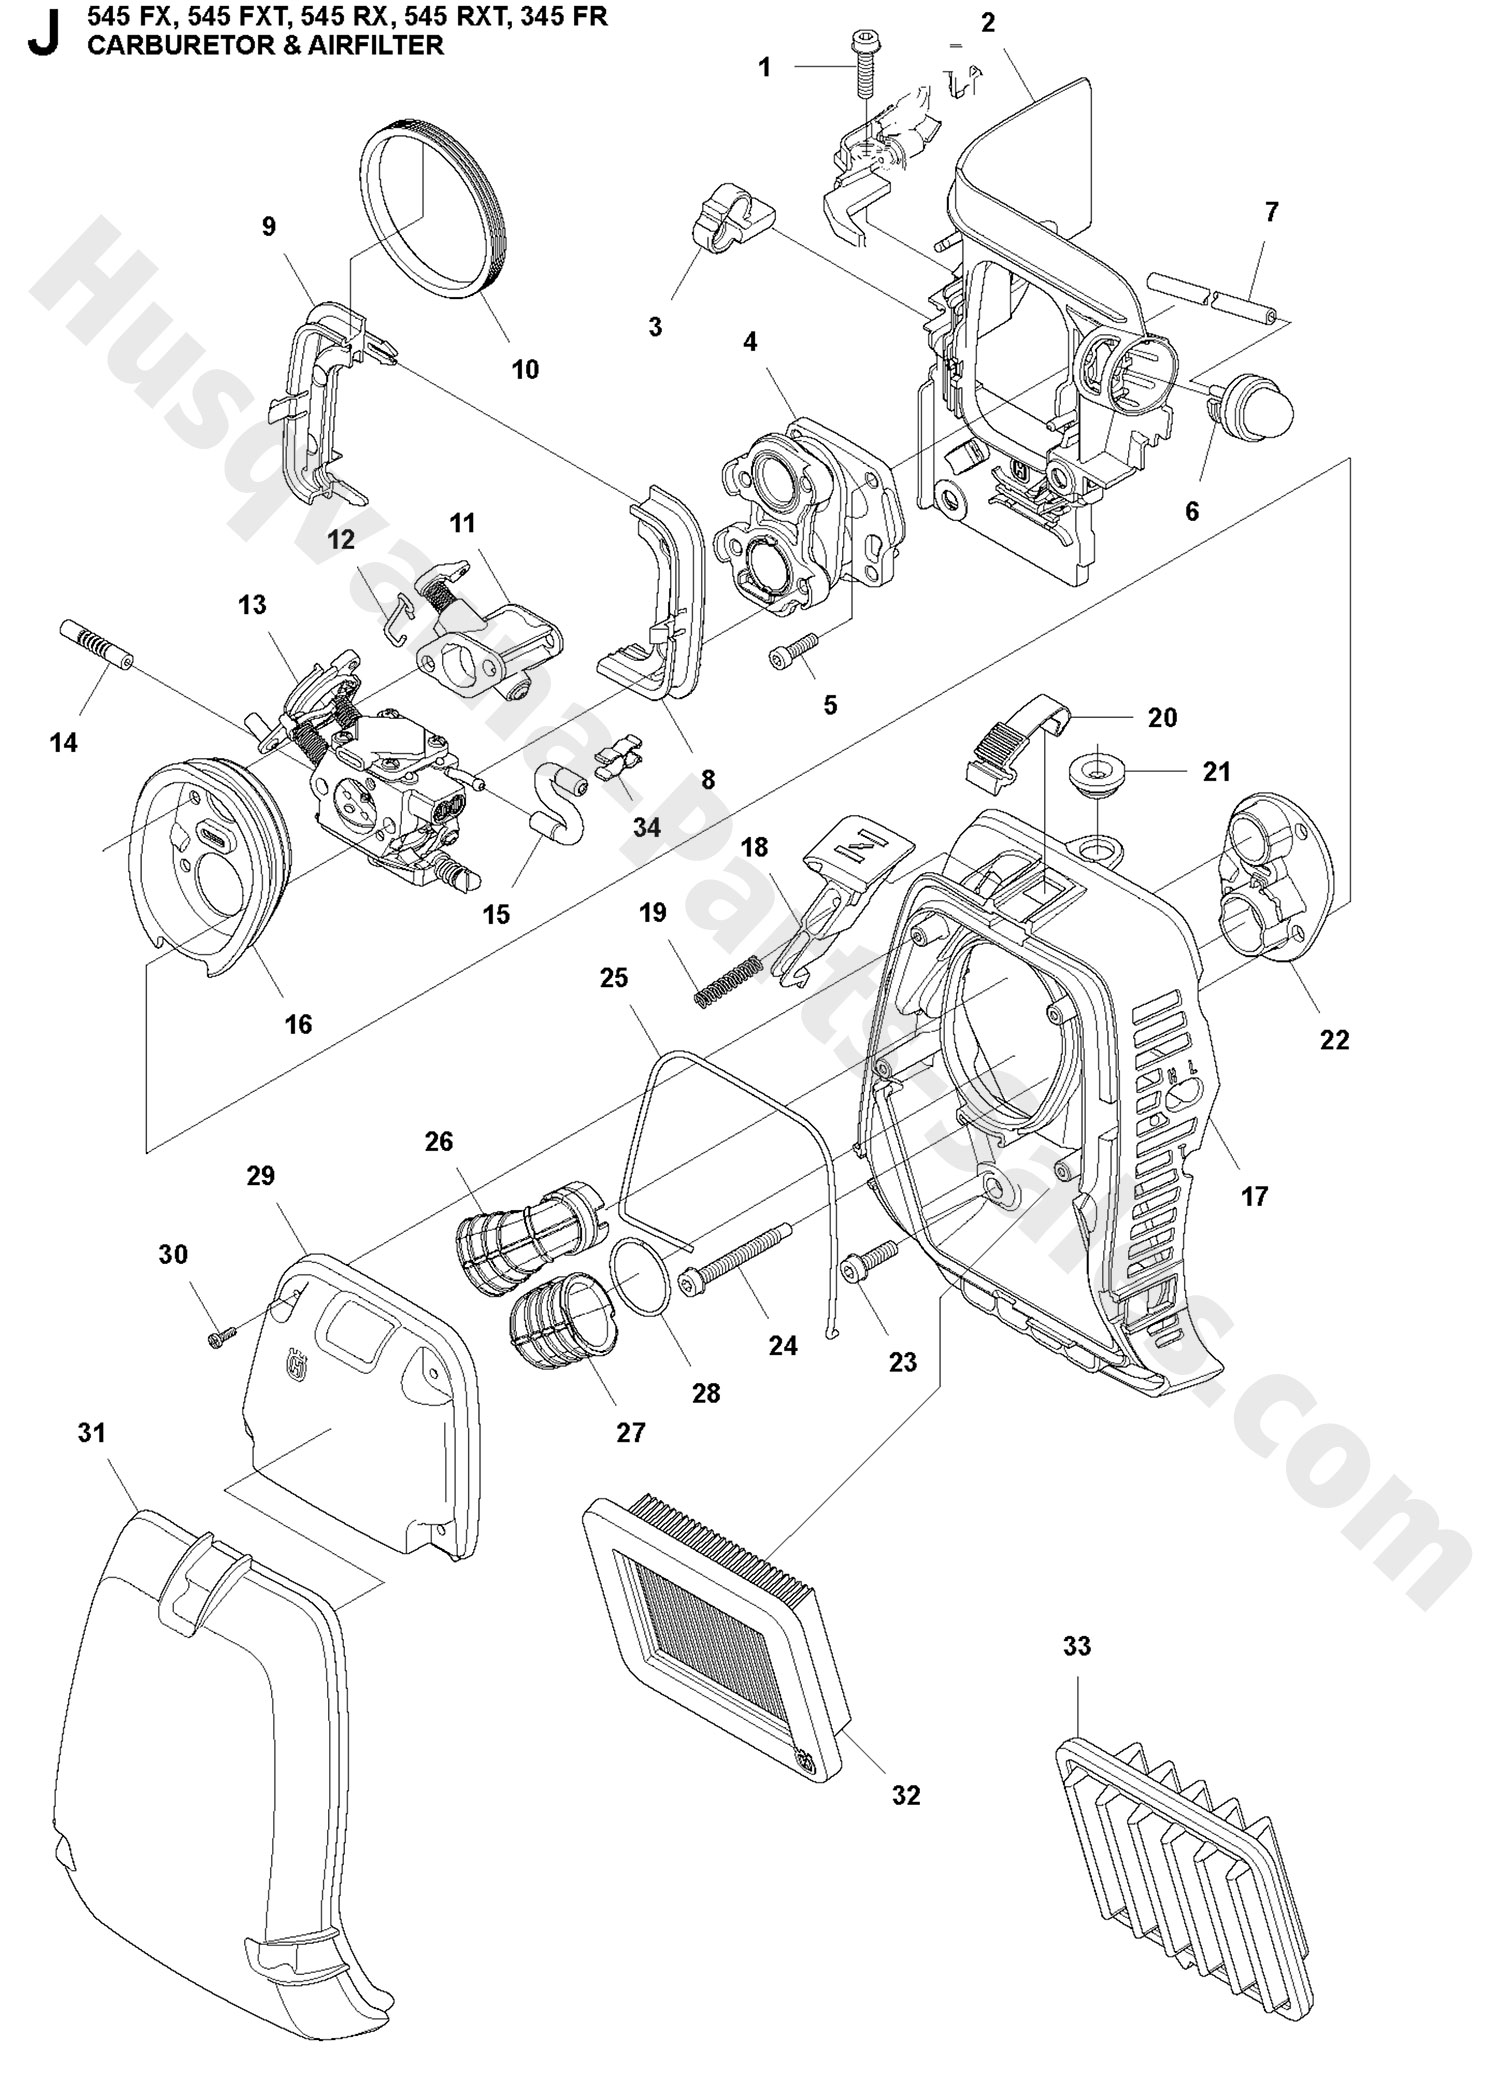 345fr Husqvarna Brushcutter Carburetor Amp Air Filter Parts